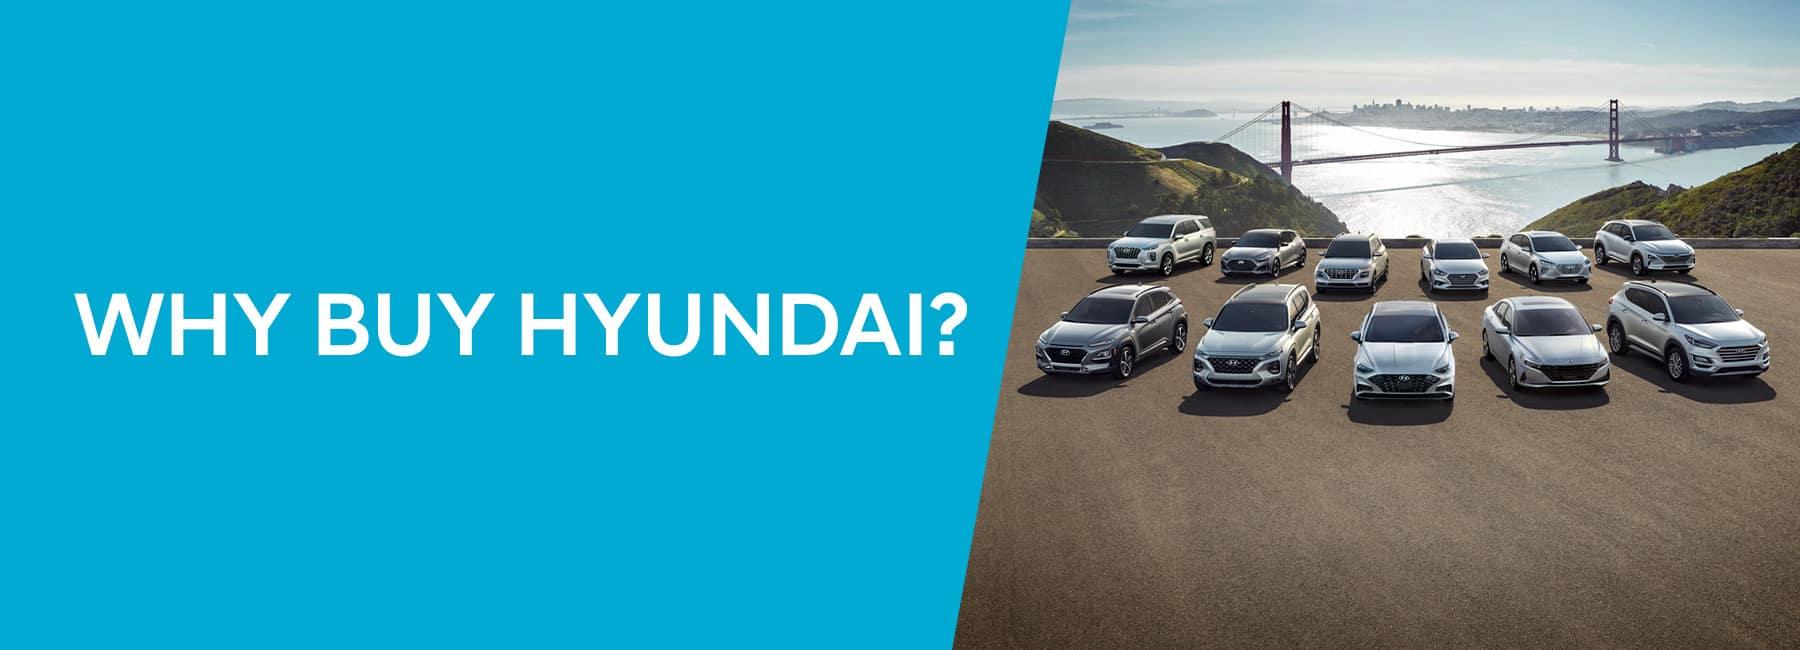 Why Buy Hyundai